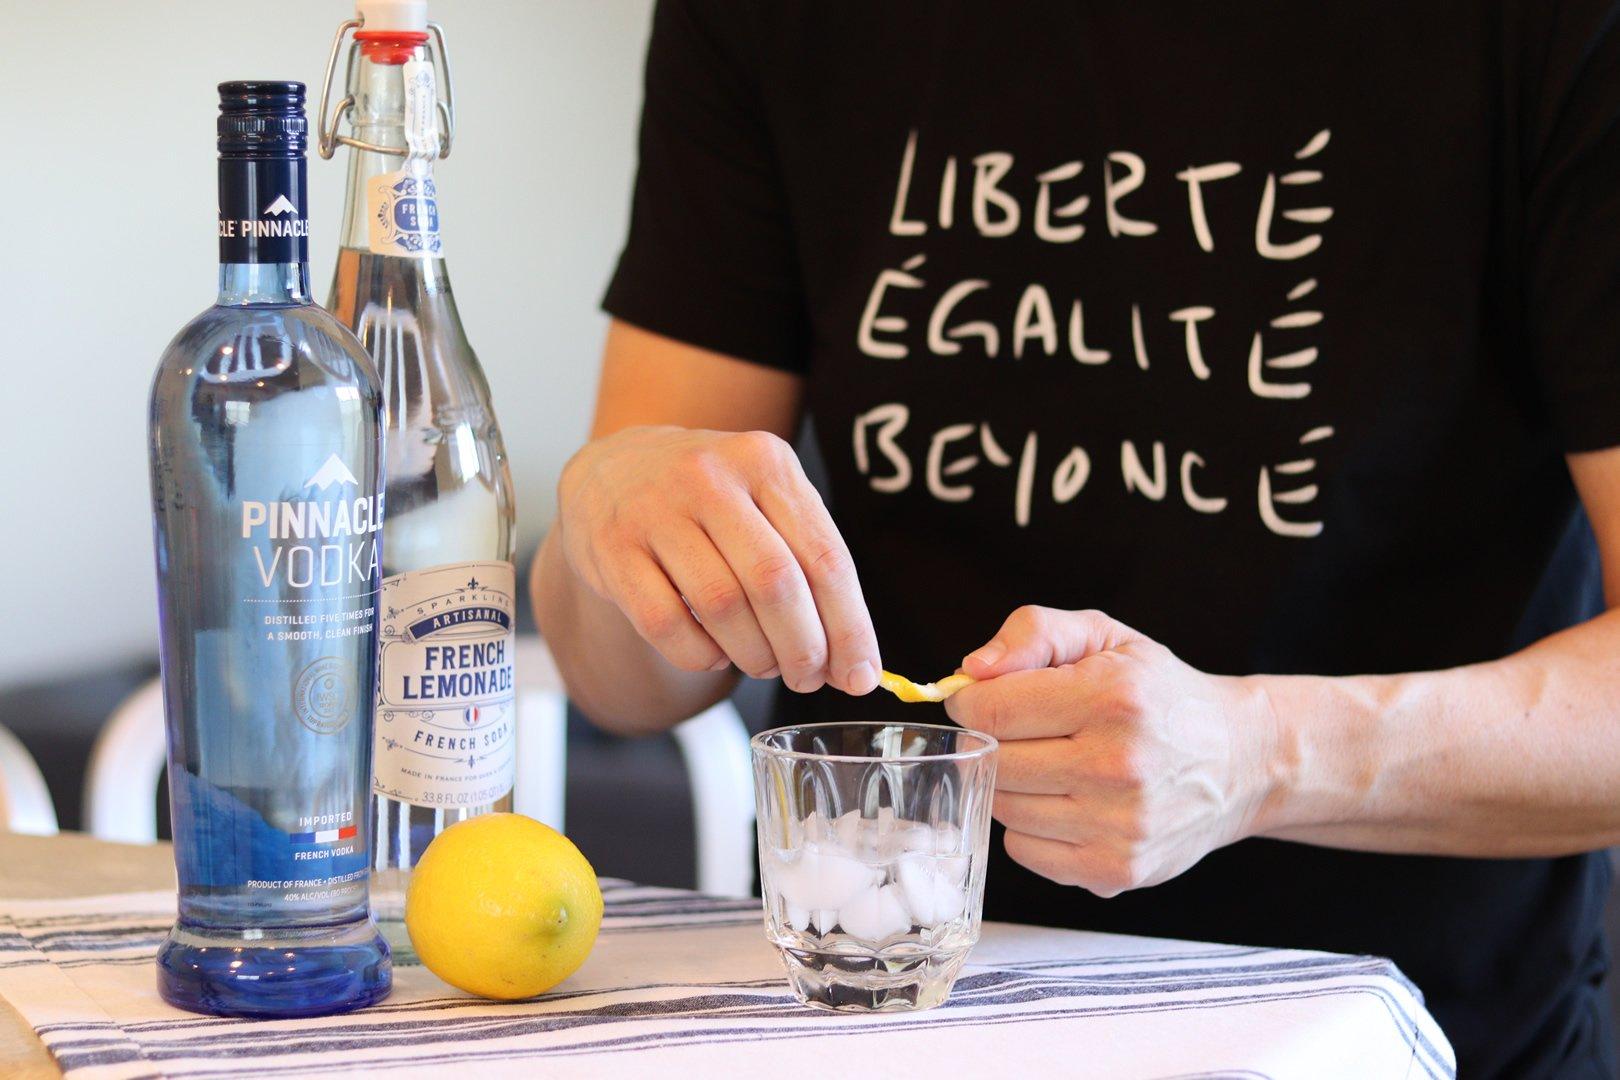 Pinnacle Vodka Promotion ©Jacob Clayton